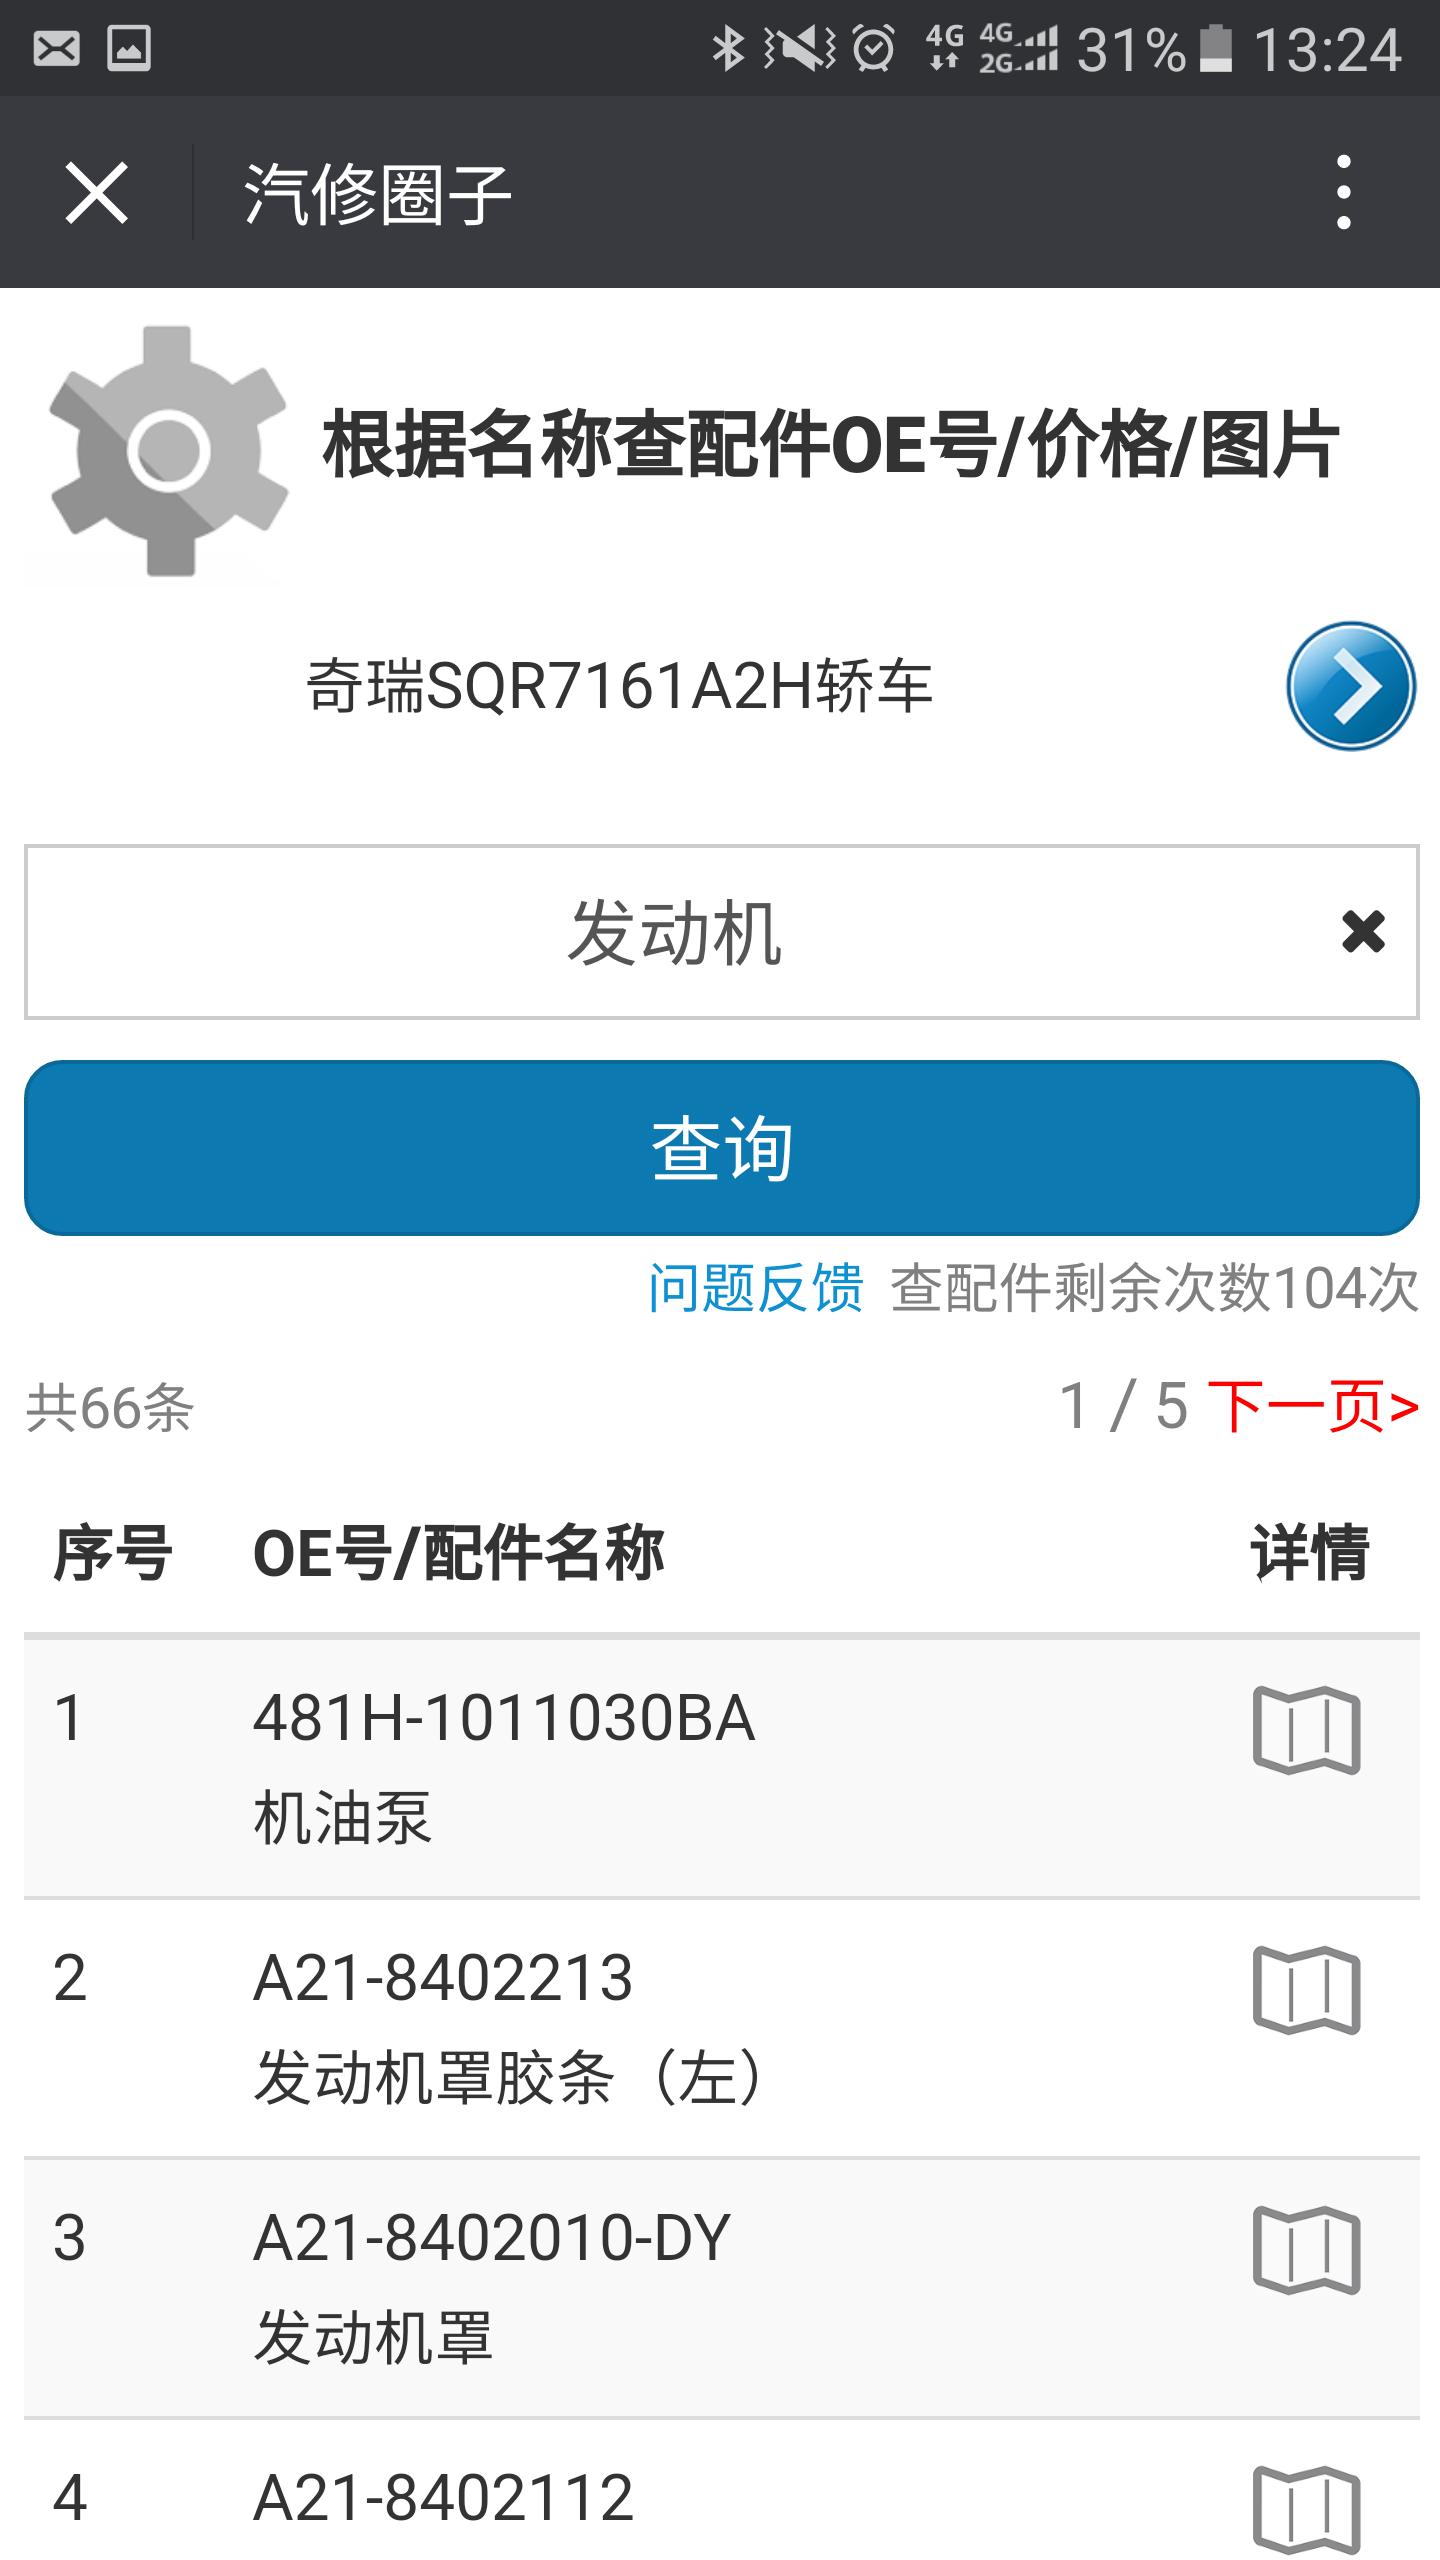 Screenshot_20170221-132342.png